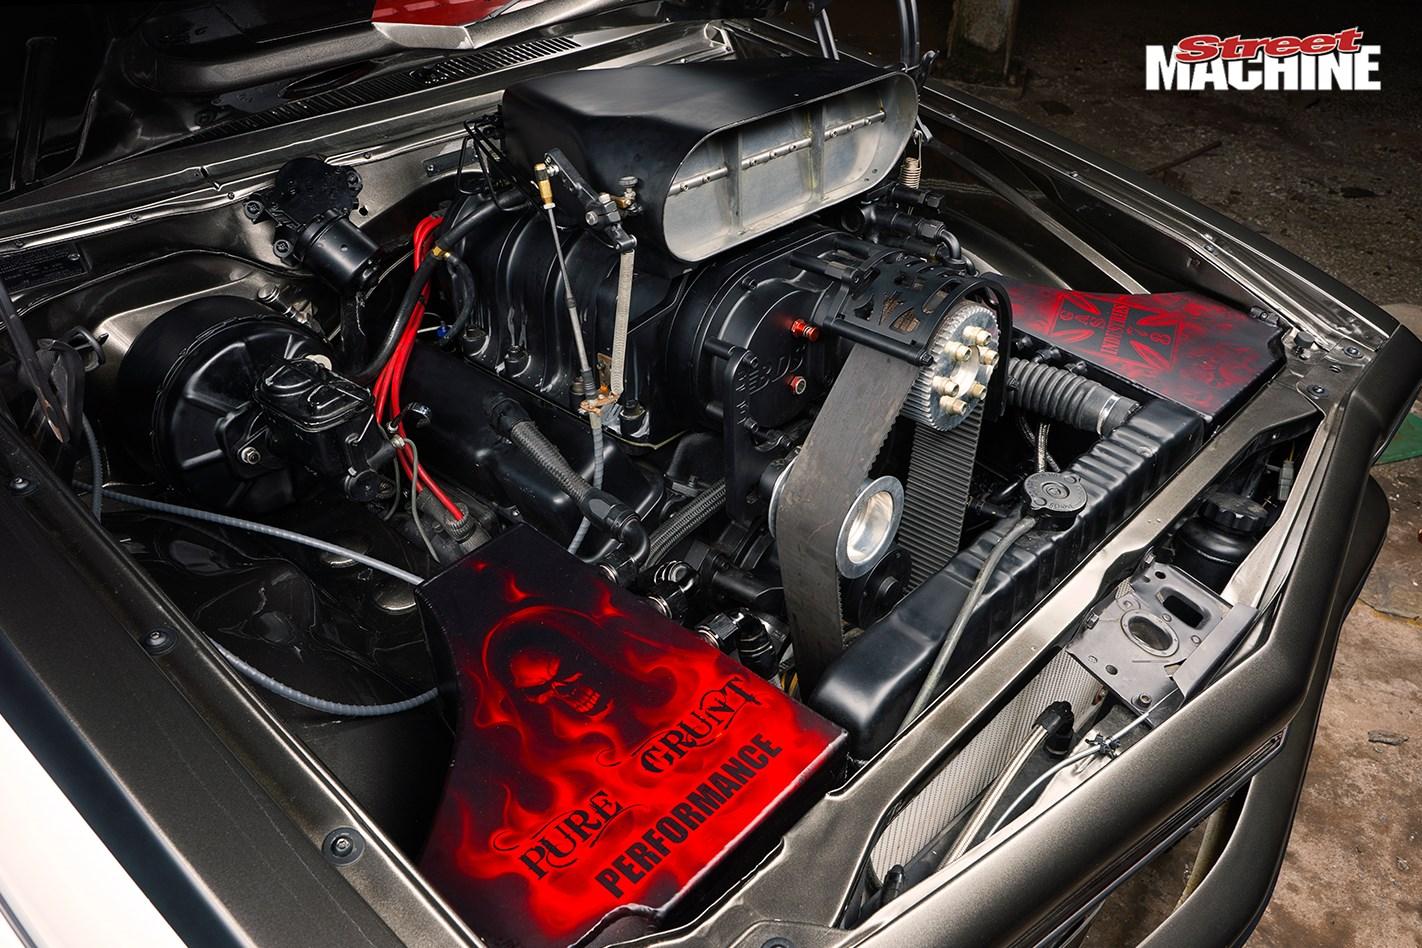 Holden Torana Killa Slr Engine Bay